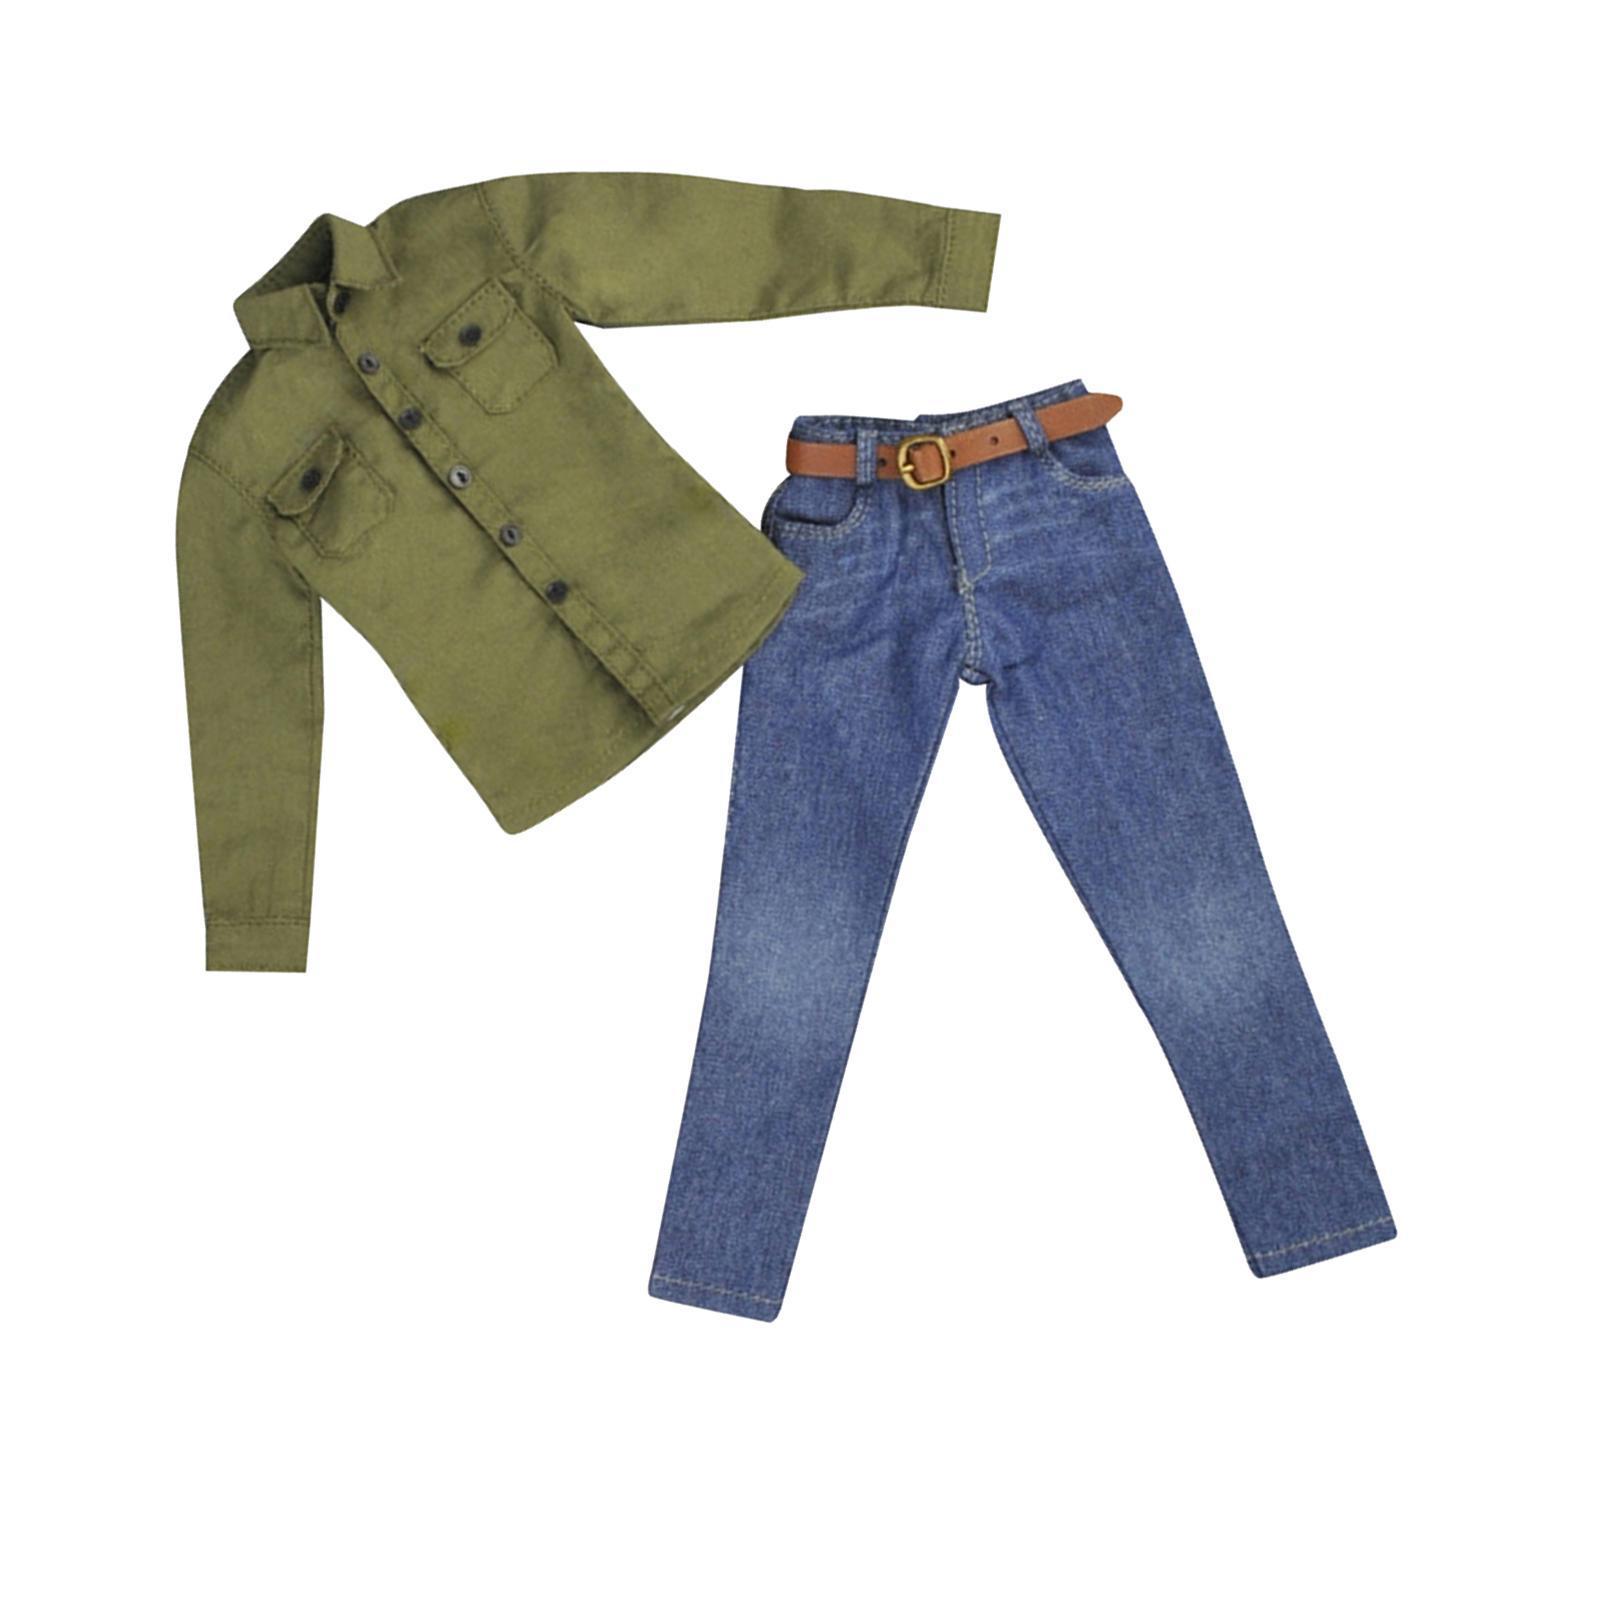 1-6-Scale-Men-039-s-Outfits-Clothes-Set-For-12-039-039-Hot-Toys-Action-Figure-Accessories miniature 35